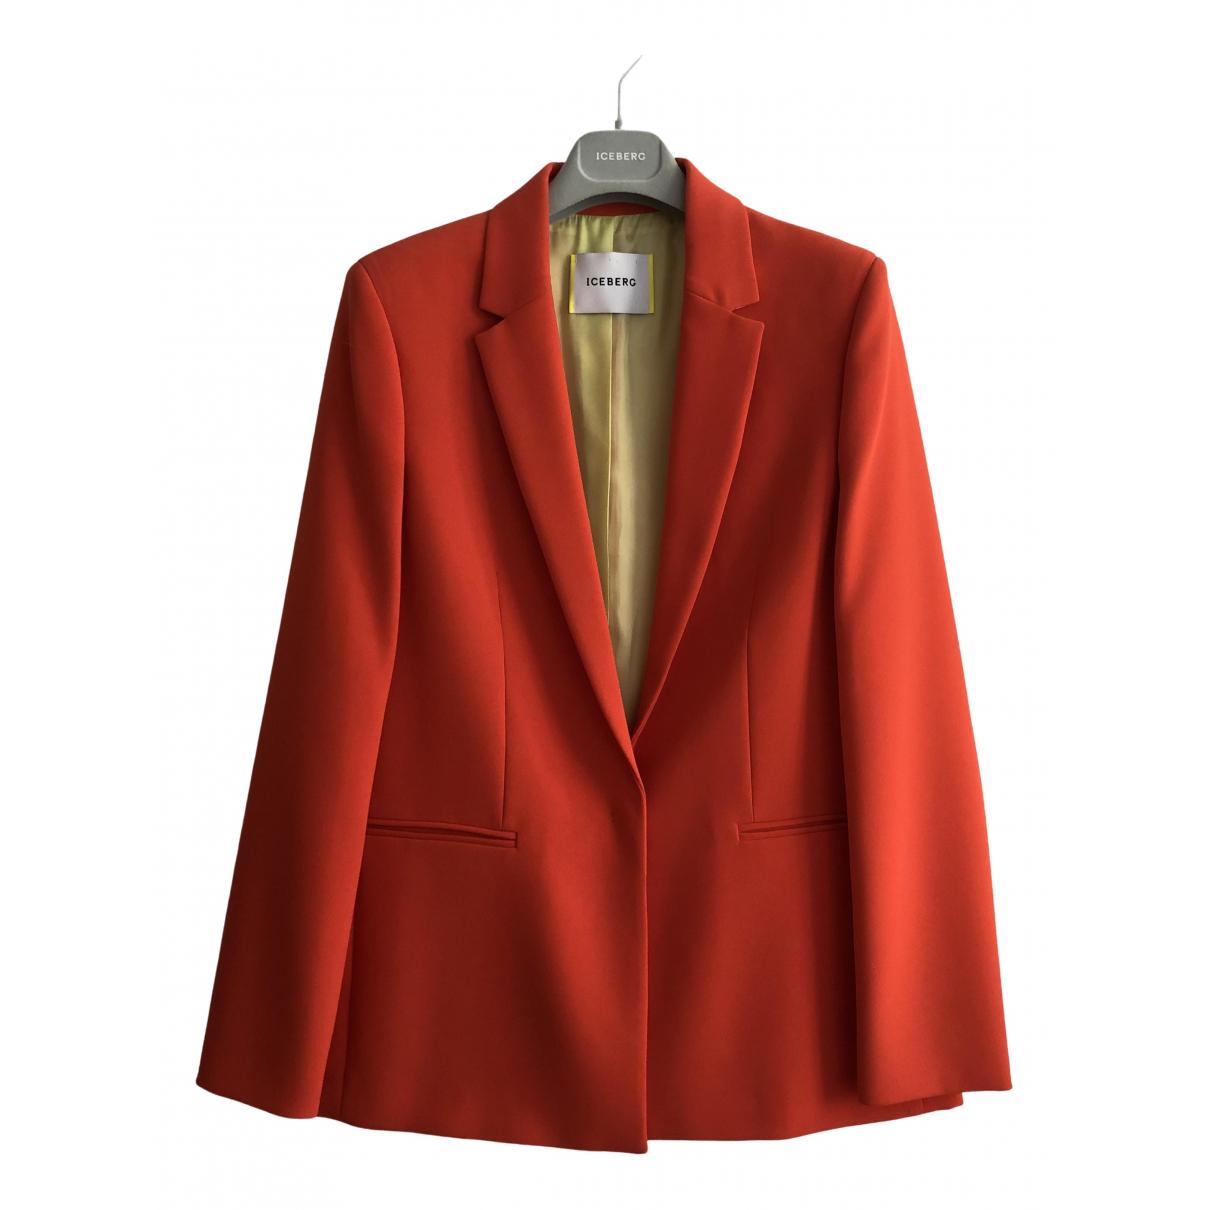 Iceberg \N Orange jacket for Women 42 IT